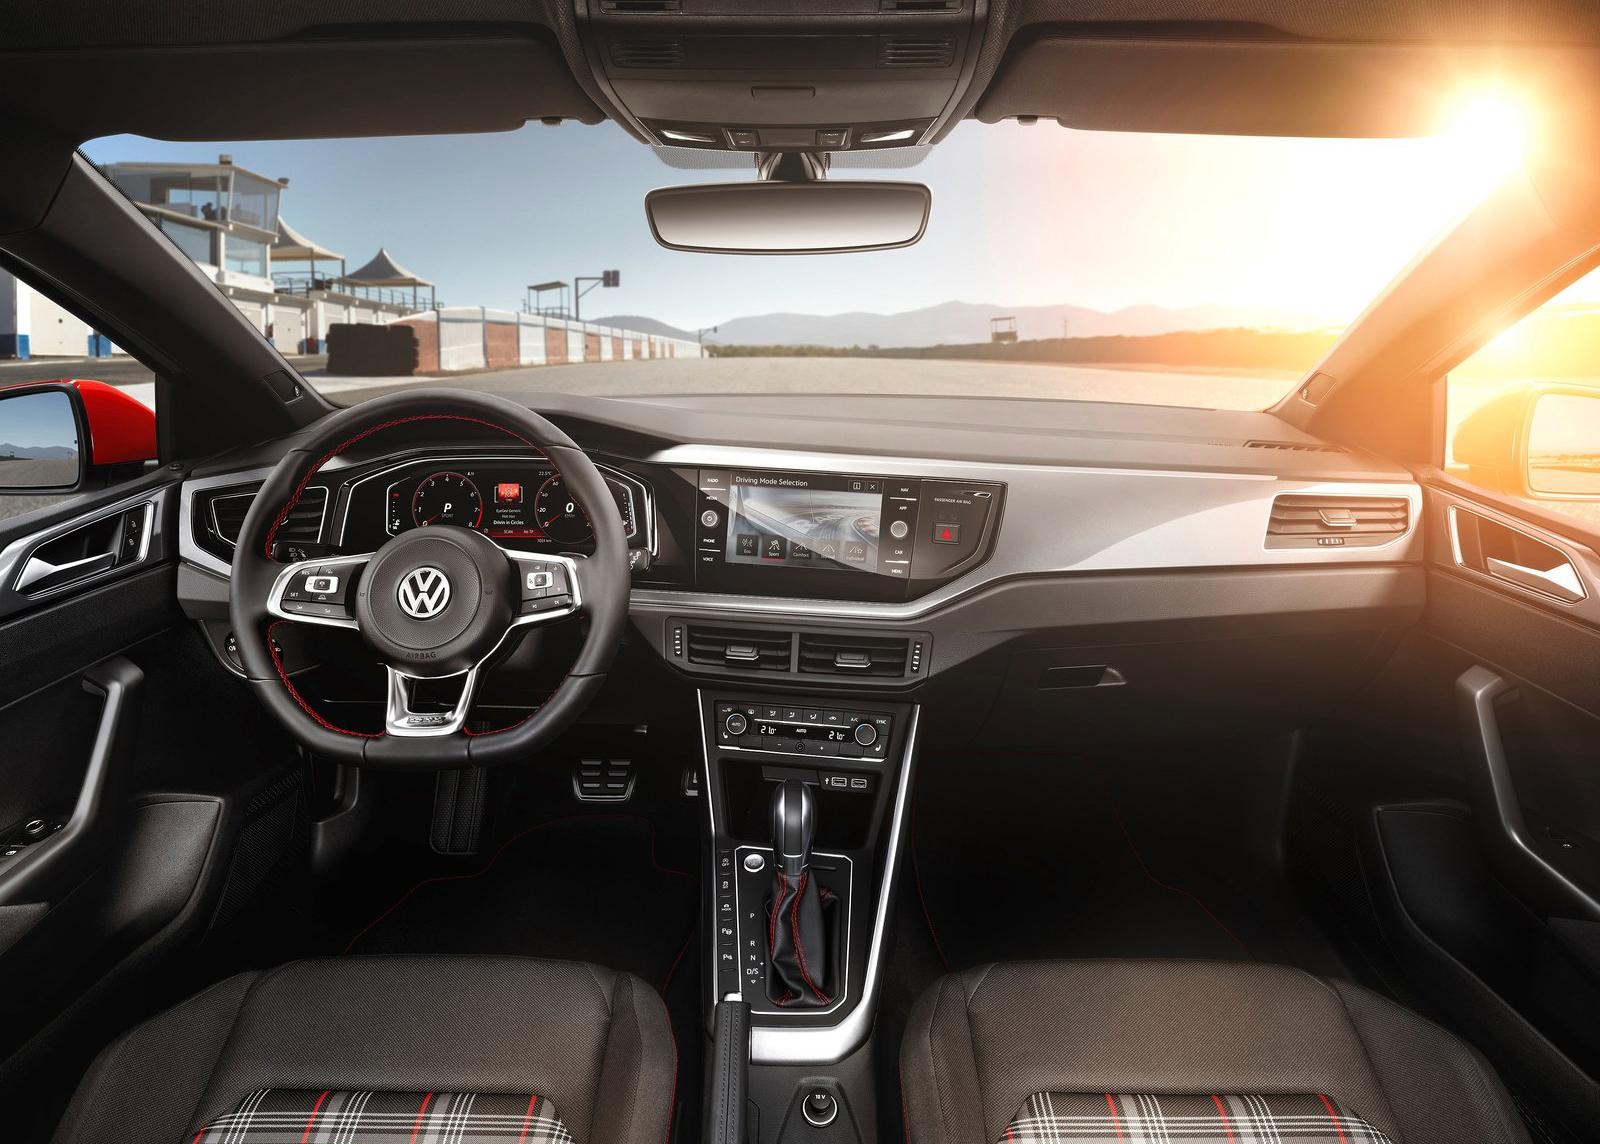 Galeria Revista De Coches Volkswagen Polo Gti 2018 Interior Imagen